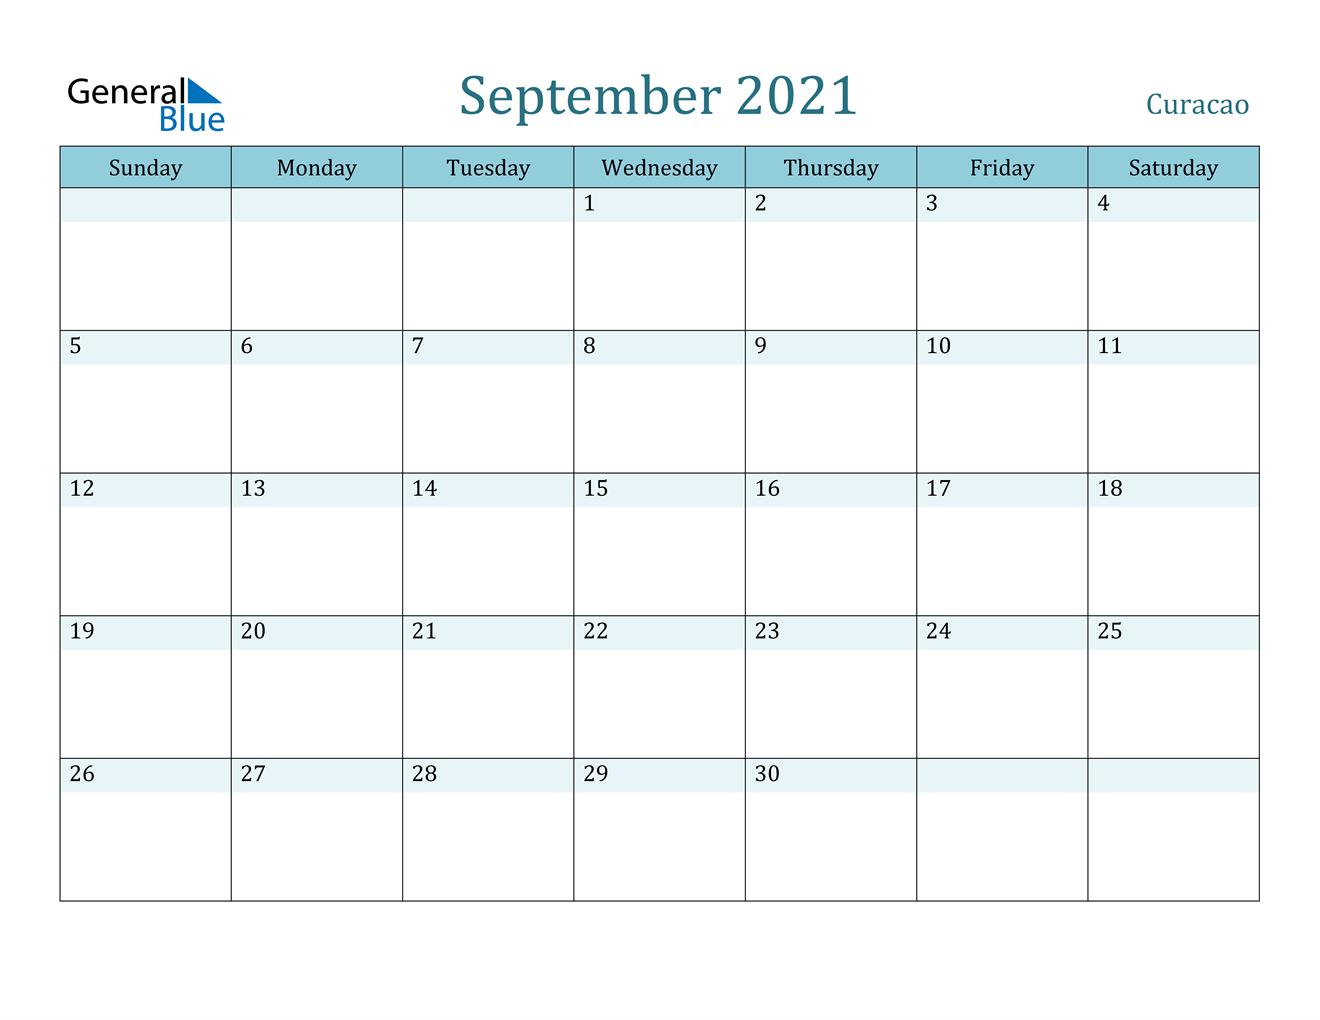 September 2021 Calendar - Curacao